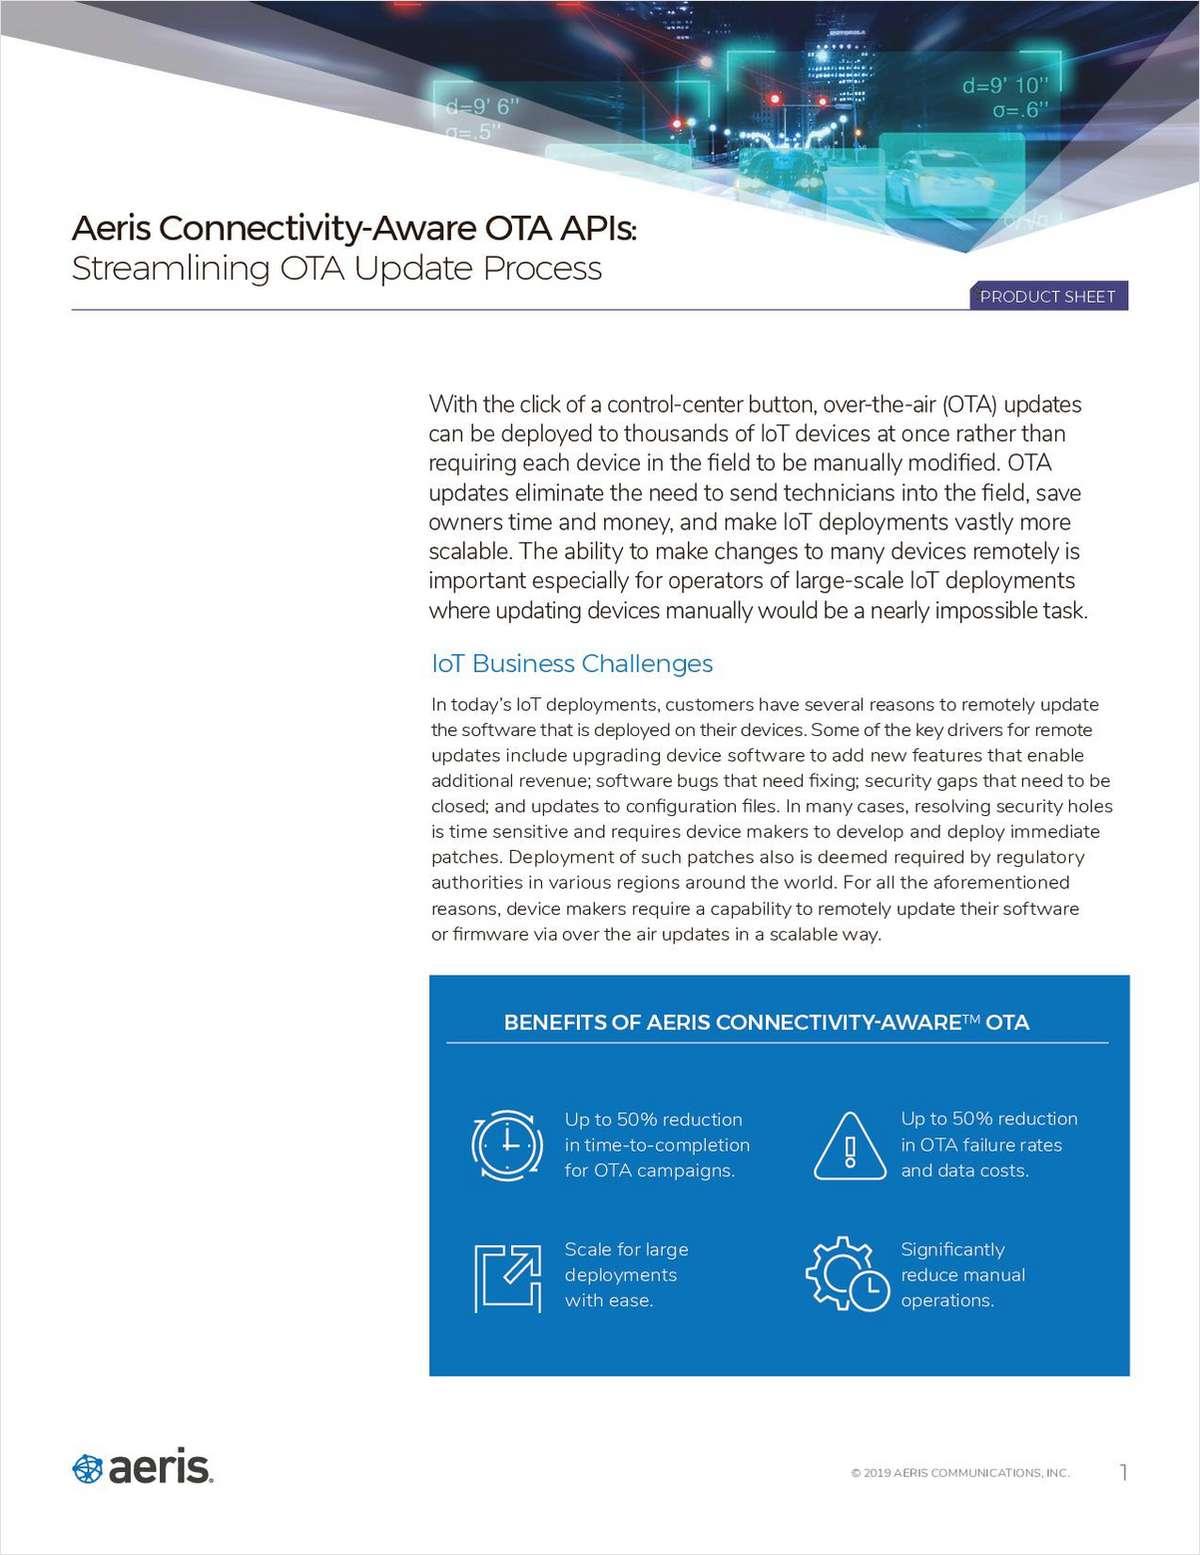 Connectivity-Aware OTA APIs: Streamlining OTA Update Process